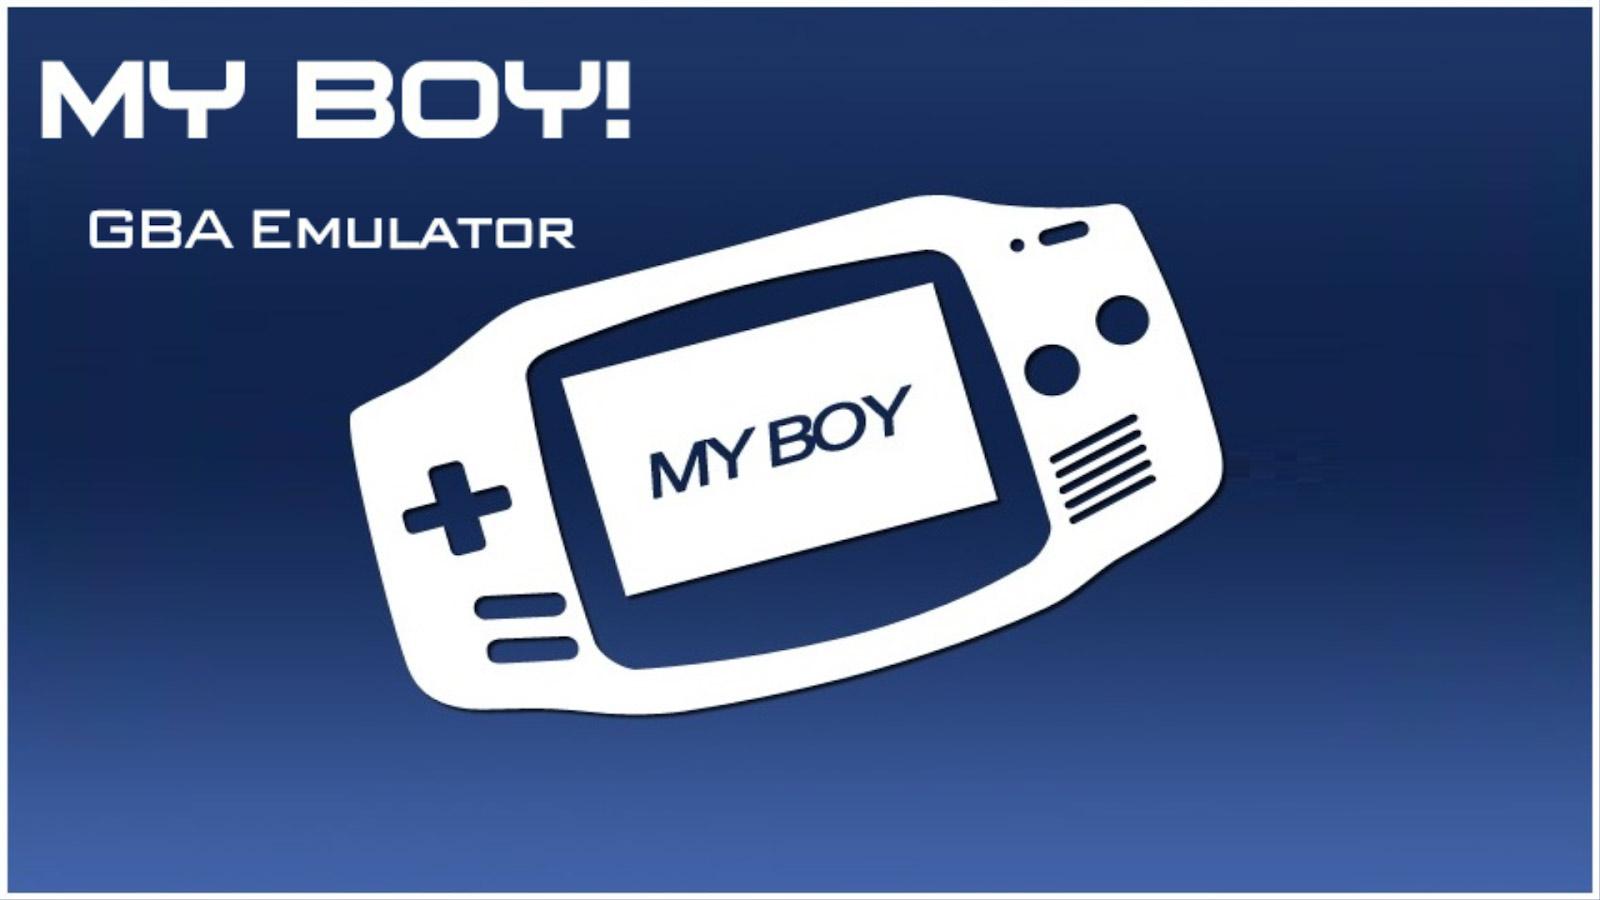 My Boy! - GBA Emulator Mod 1.8.0 (Full Unloked)